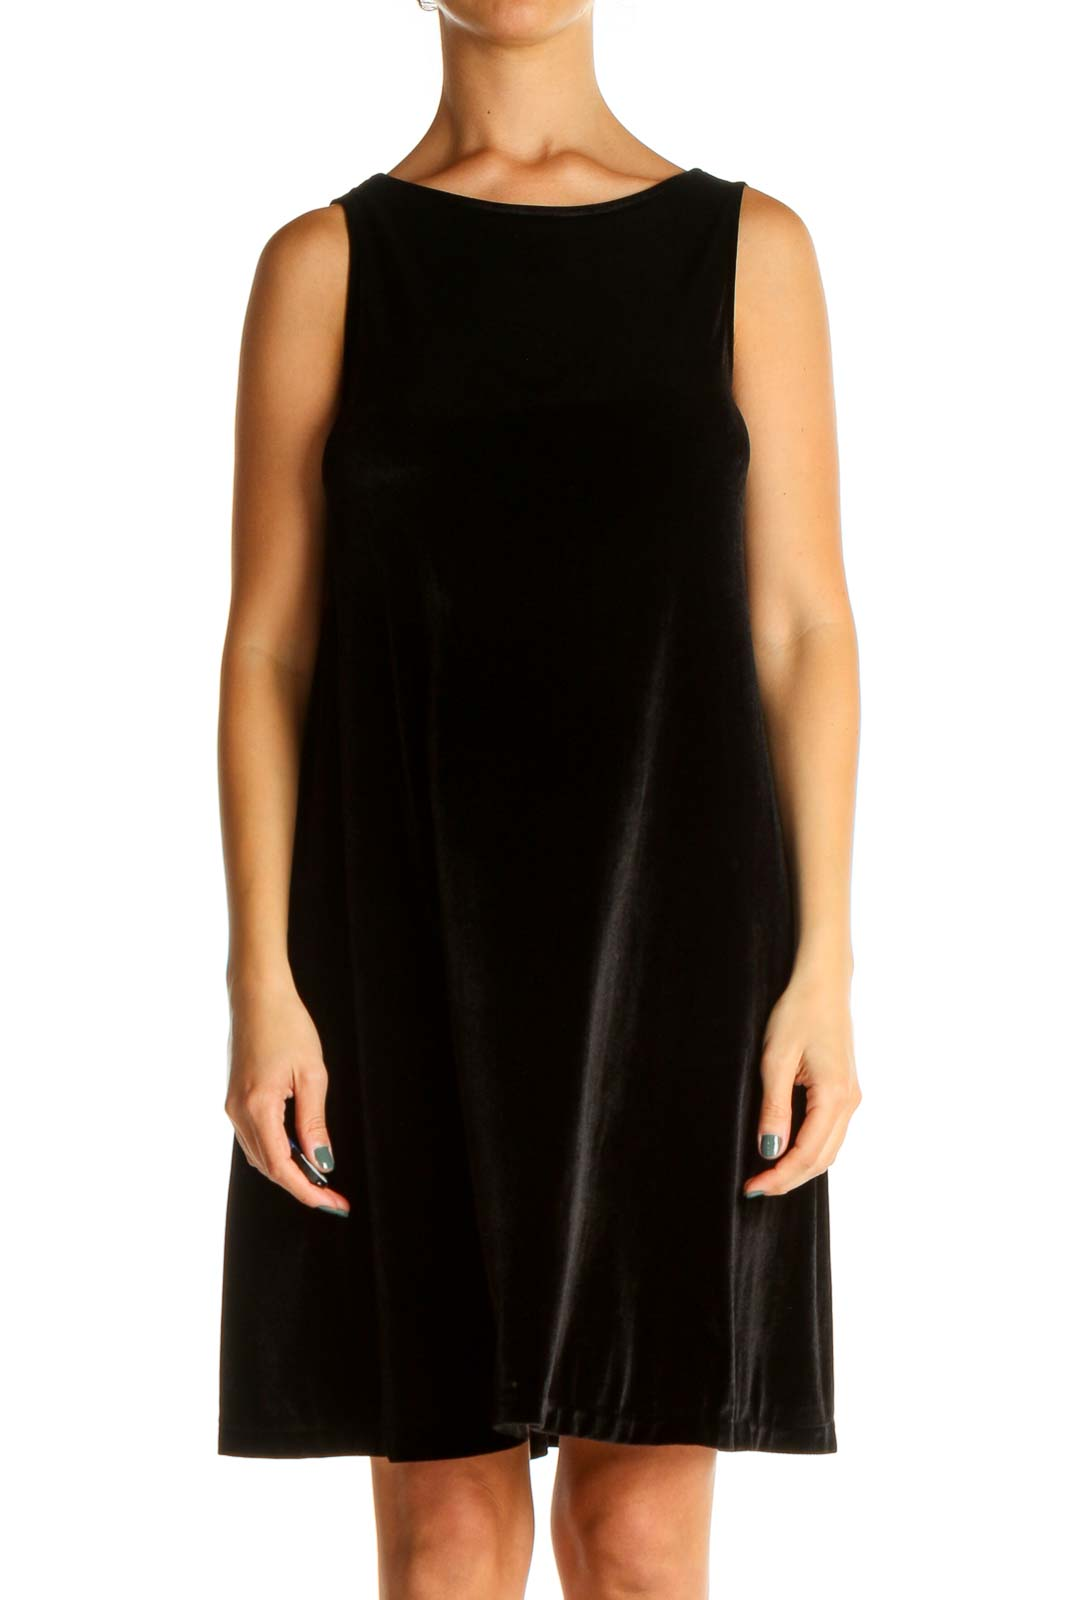 Black Solid Velvet Classic A-Line Dress Front